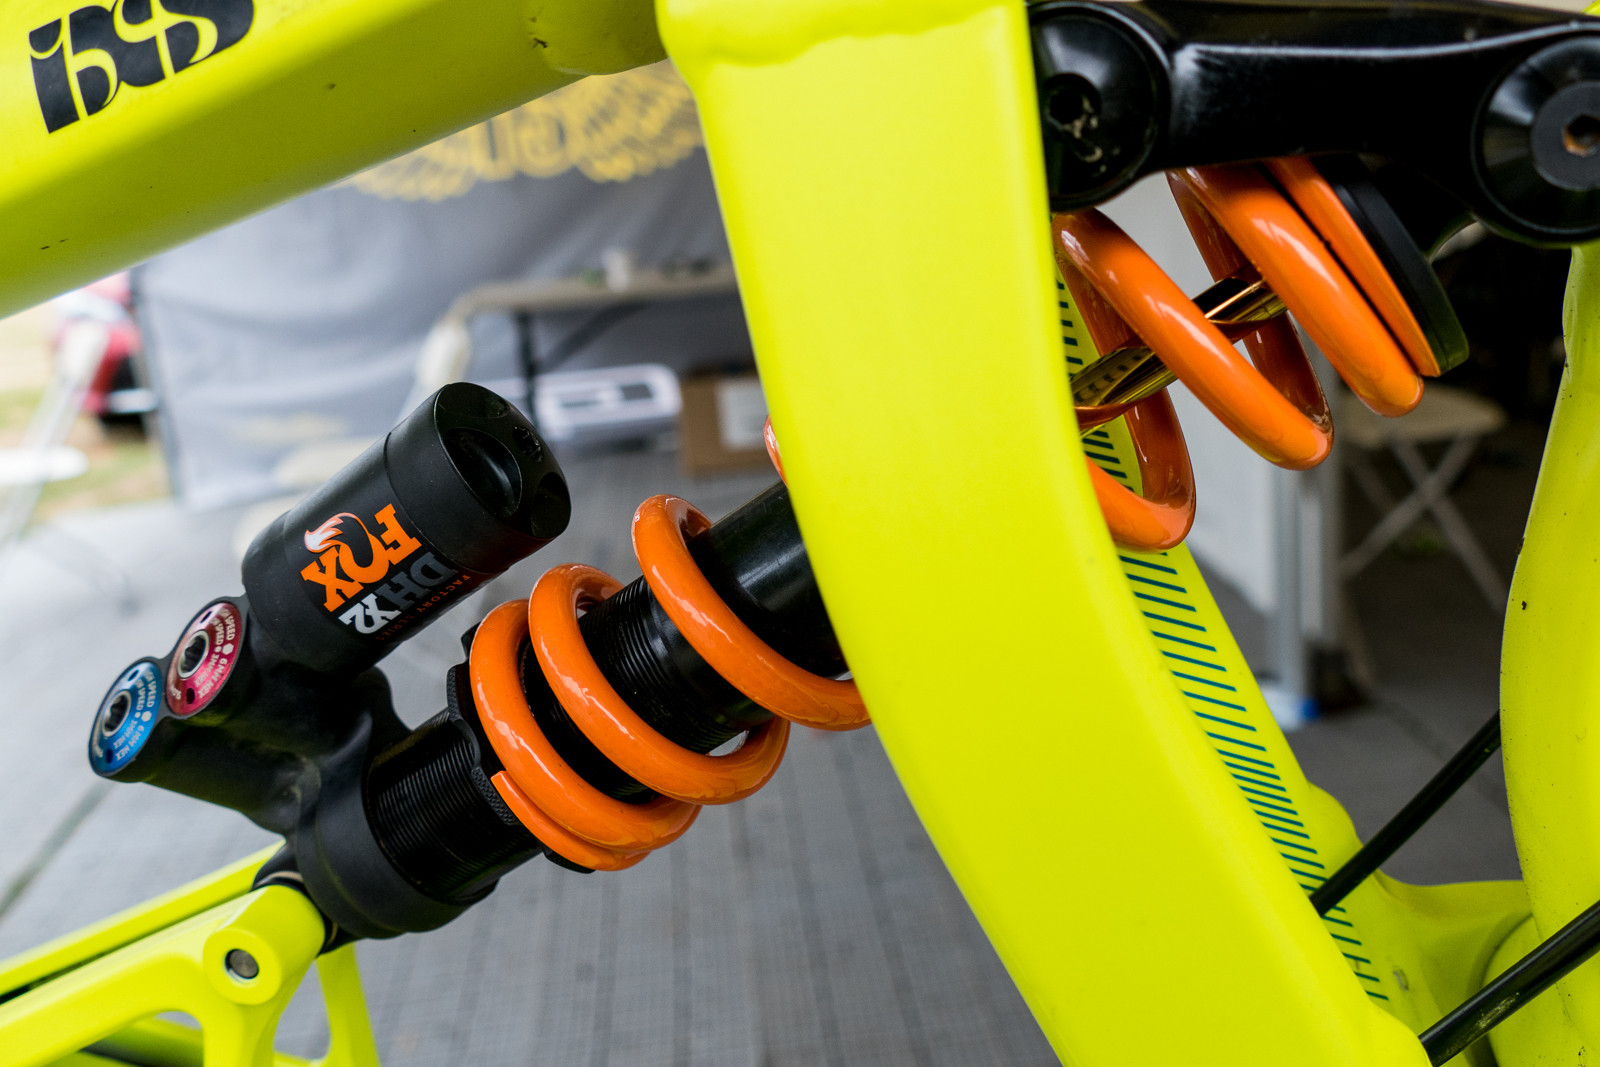 FOX DHX2 Shock on Gee Atherton's GT Fury - PIT BITS - Crankworx Rotorua - Mountain Biking Pictures - Vital MTB